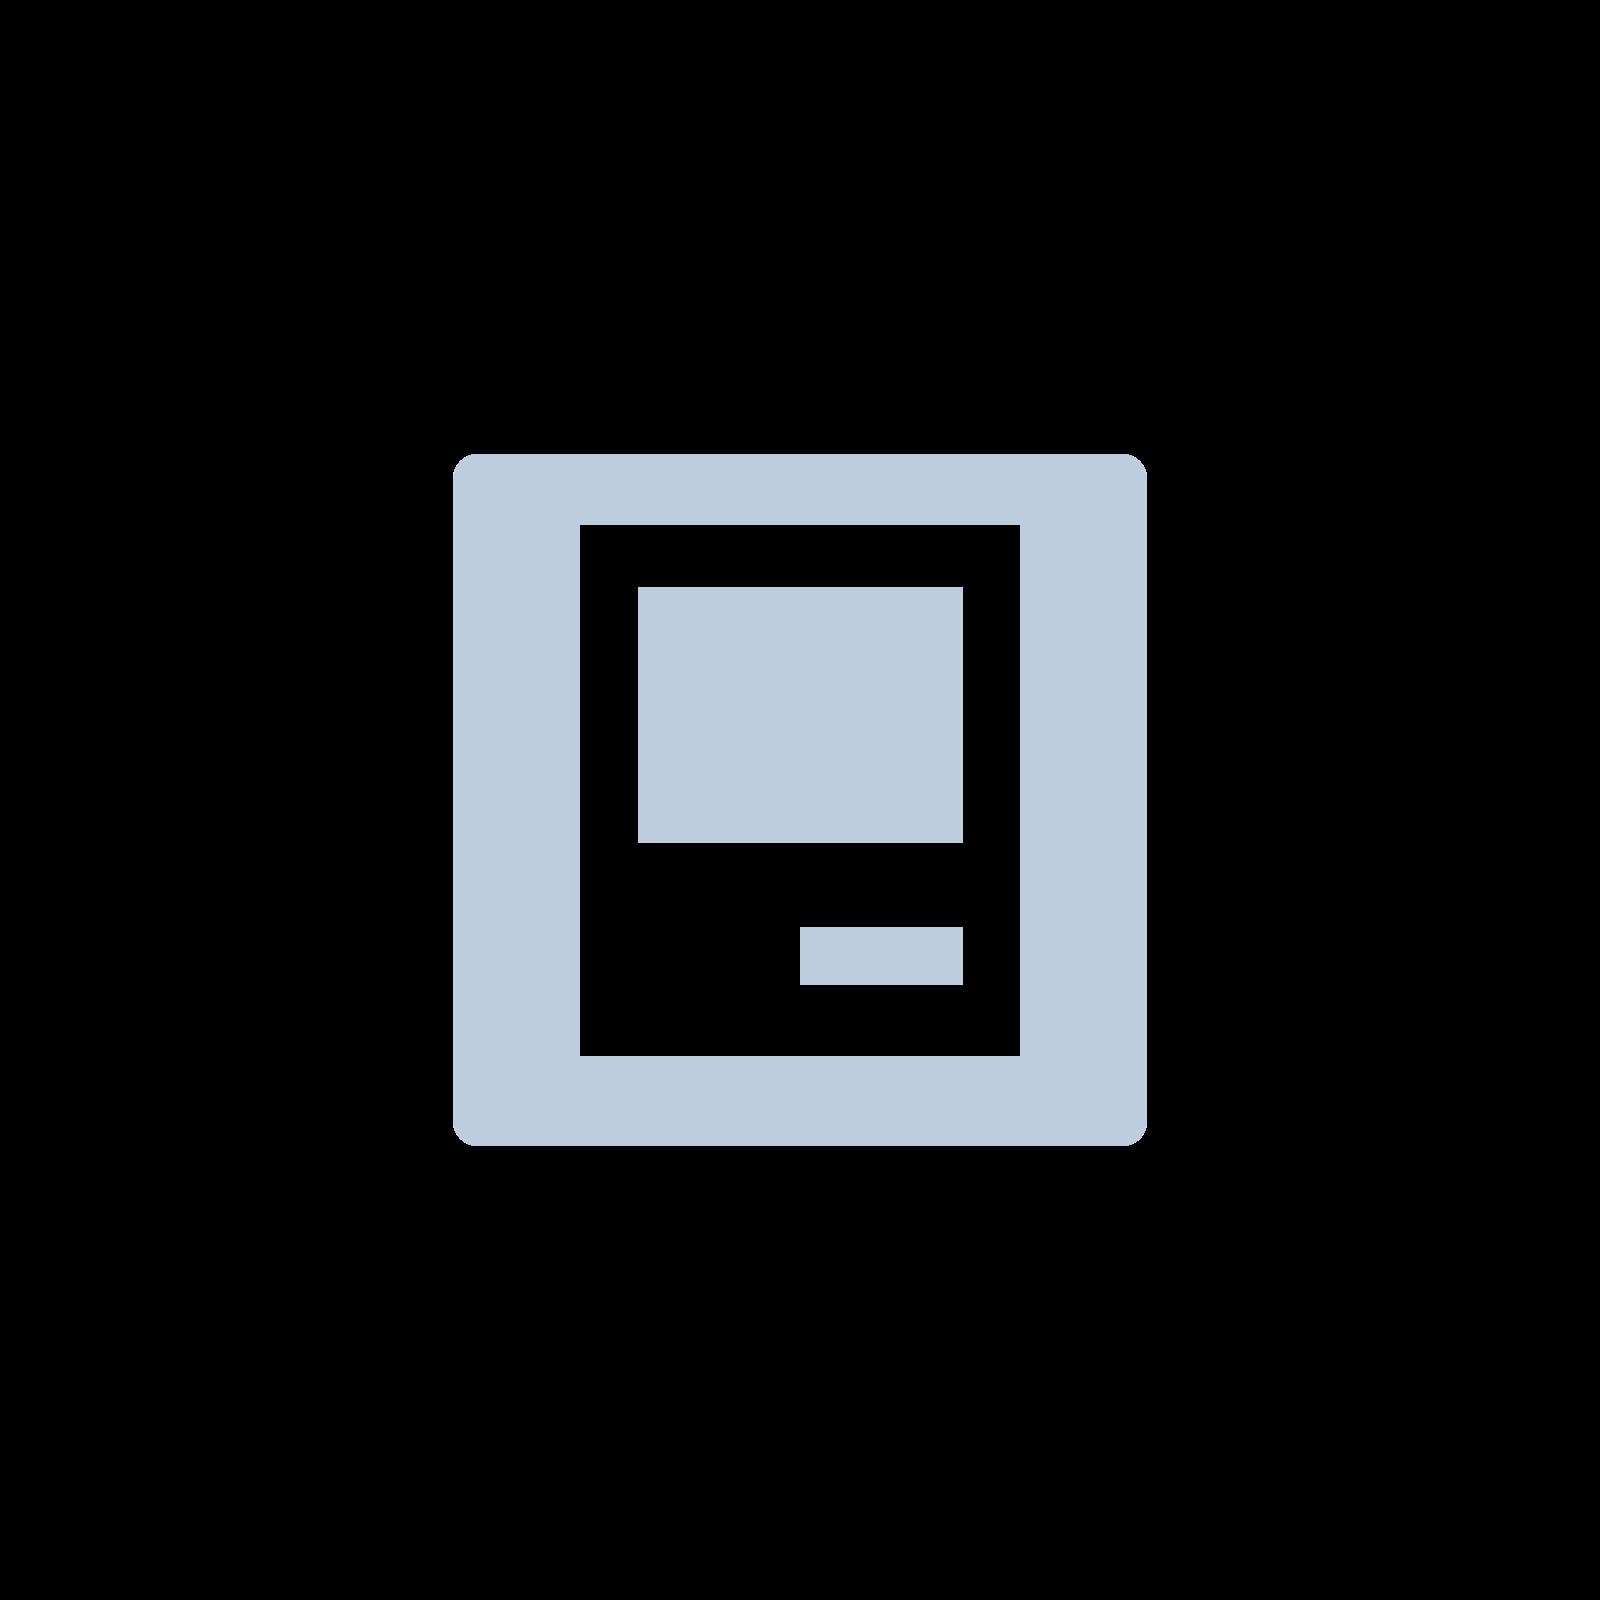 Mac mini Core 2 Duo 1.83 GHz (Macmini2,1, 80GB, 1GB)